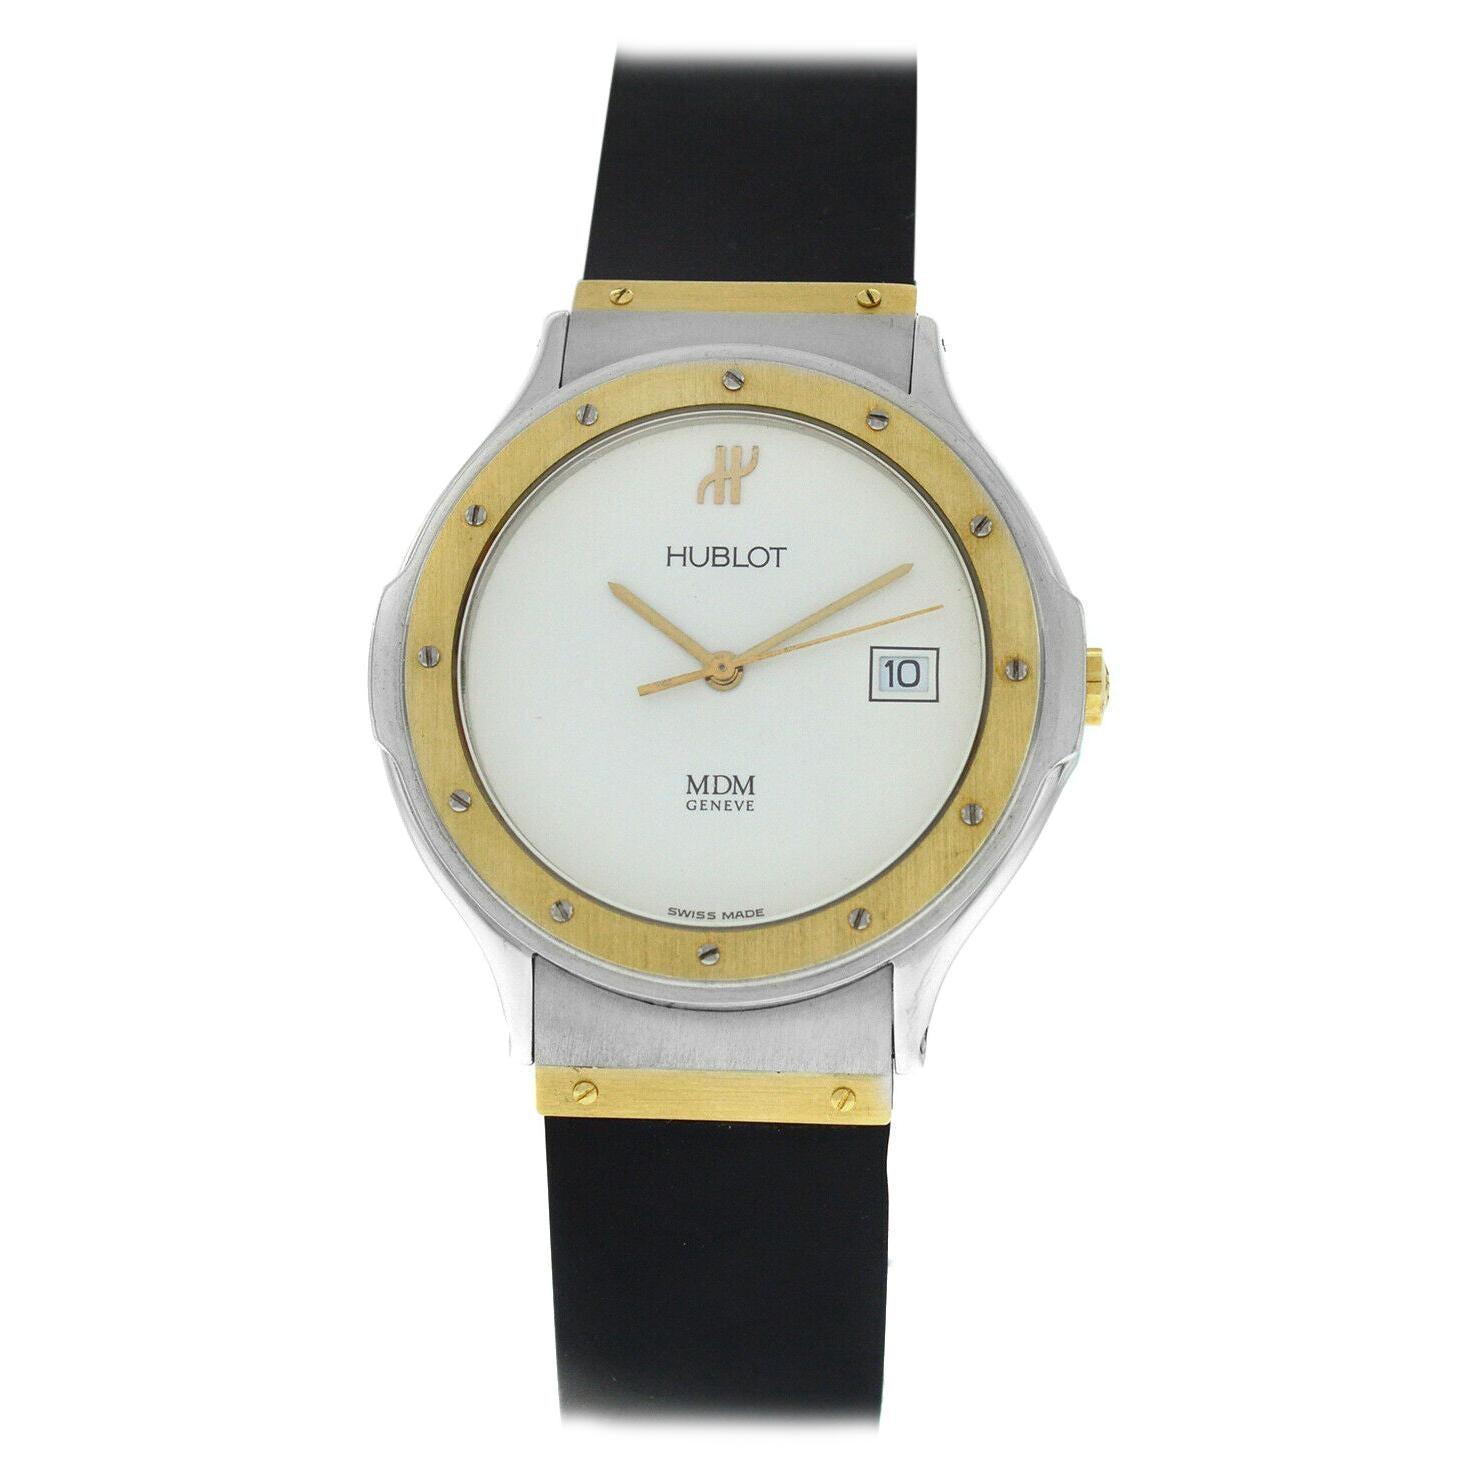 Hublot MDM Geneve Classic White Dial 18k Gold/Steel Quartz Watch 1523.2